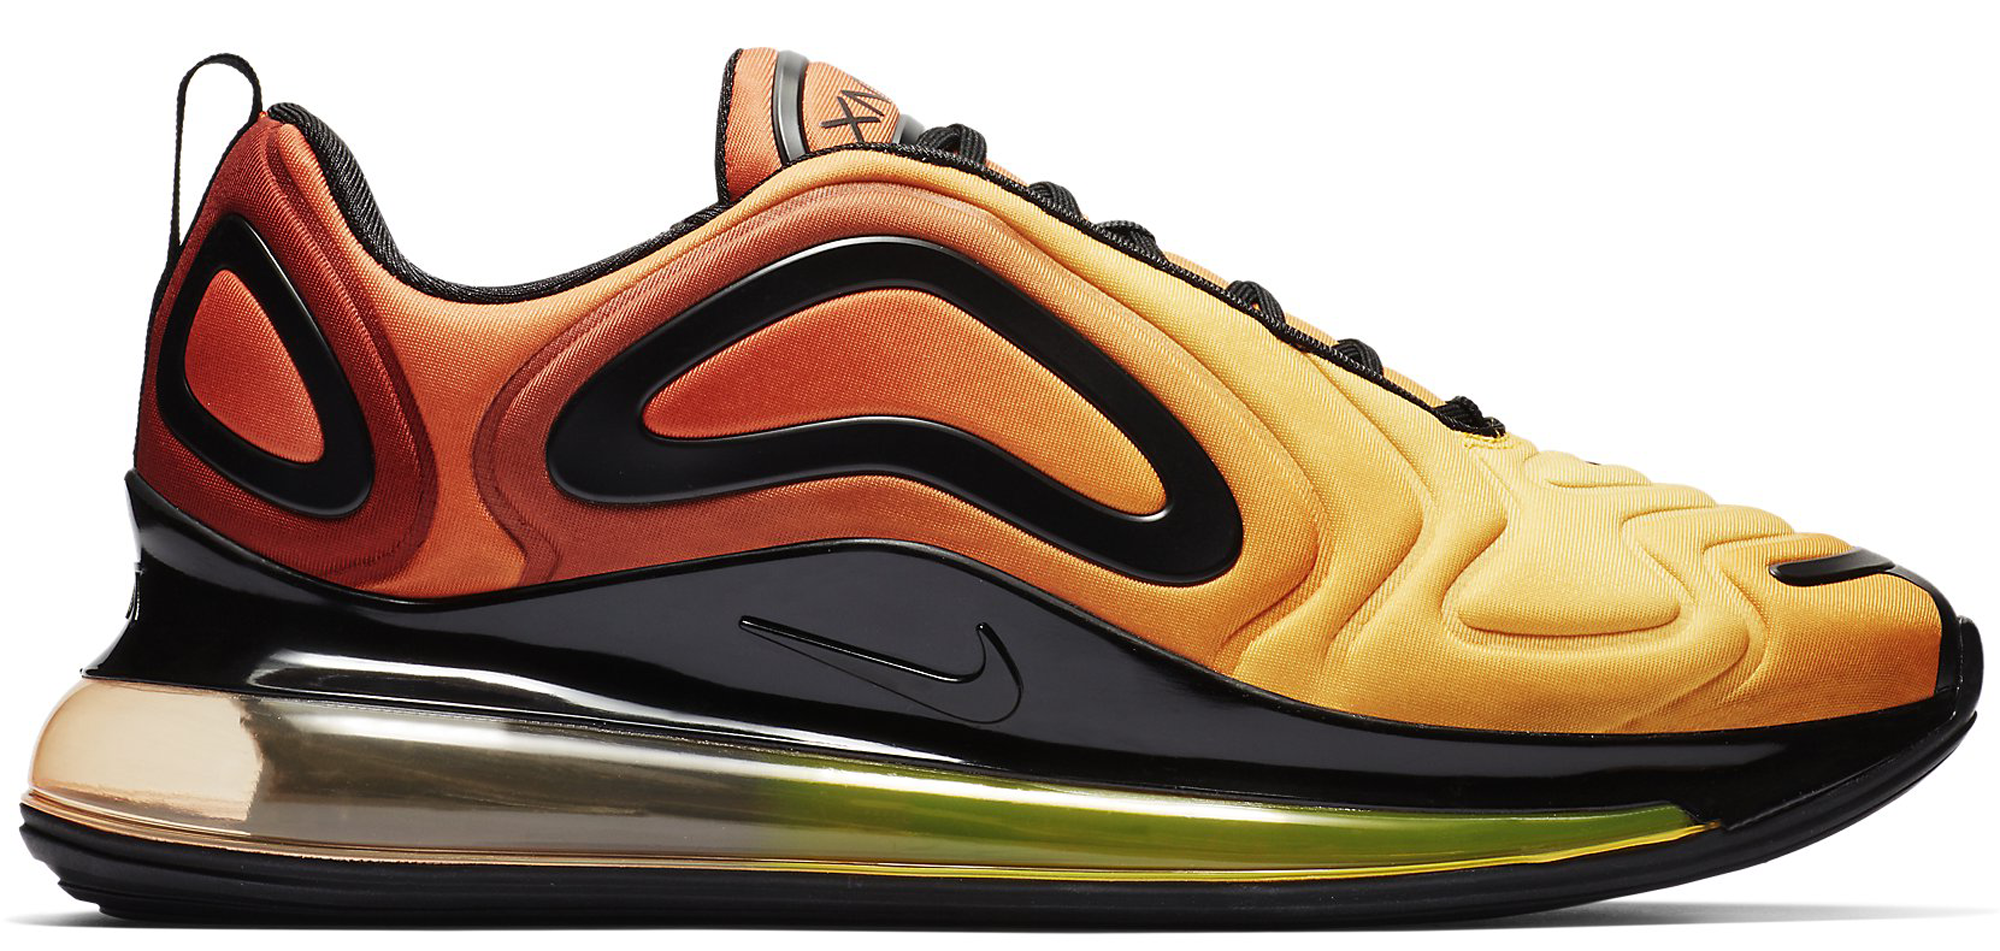 Nike Air Max 720 Sunrise - AO2924-800